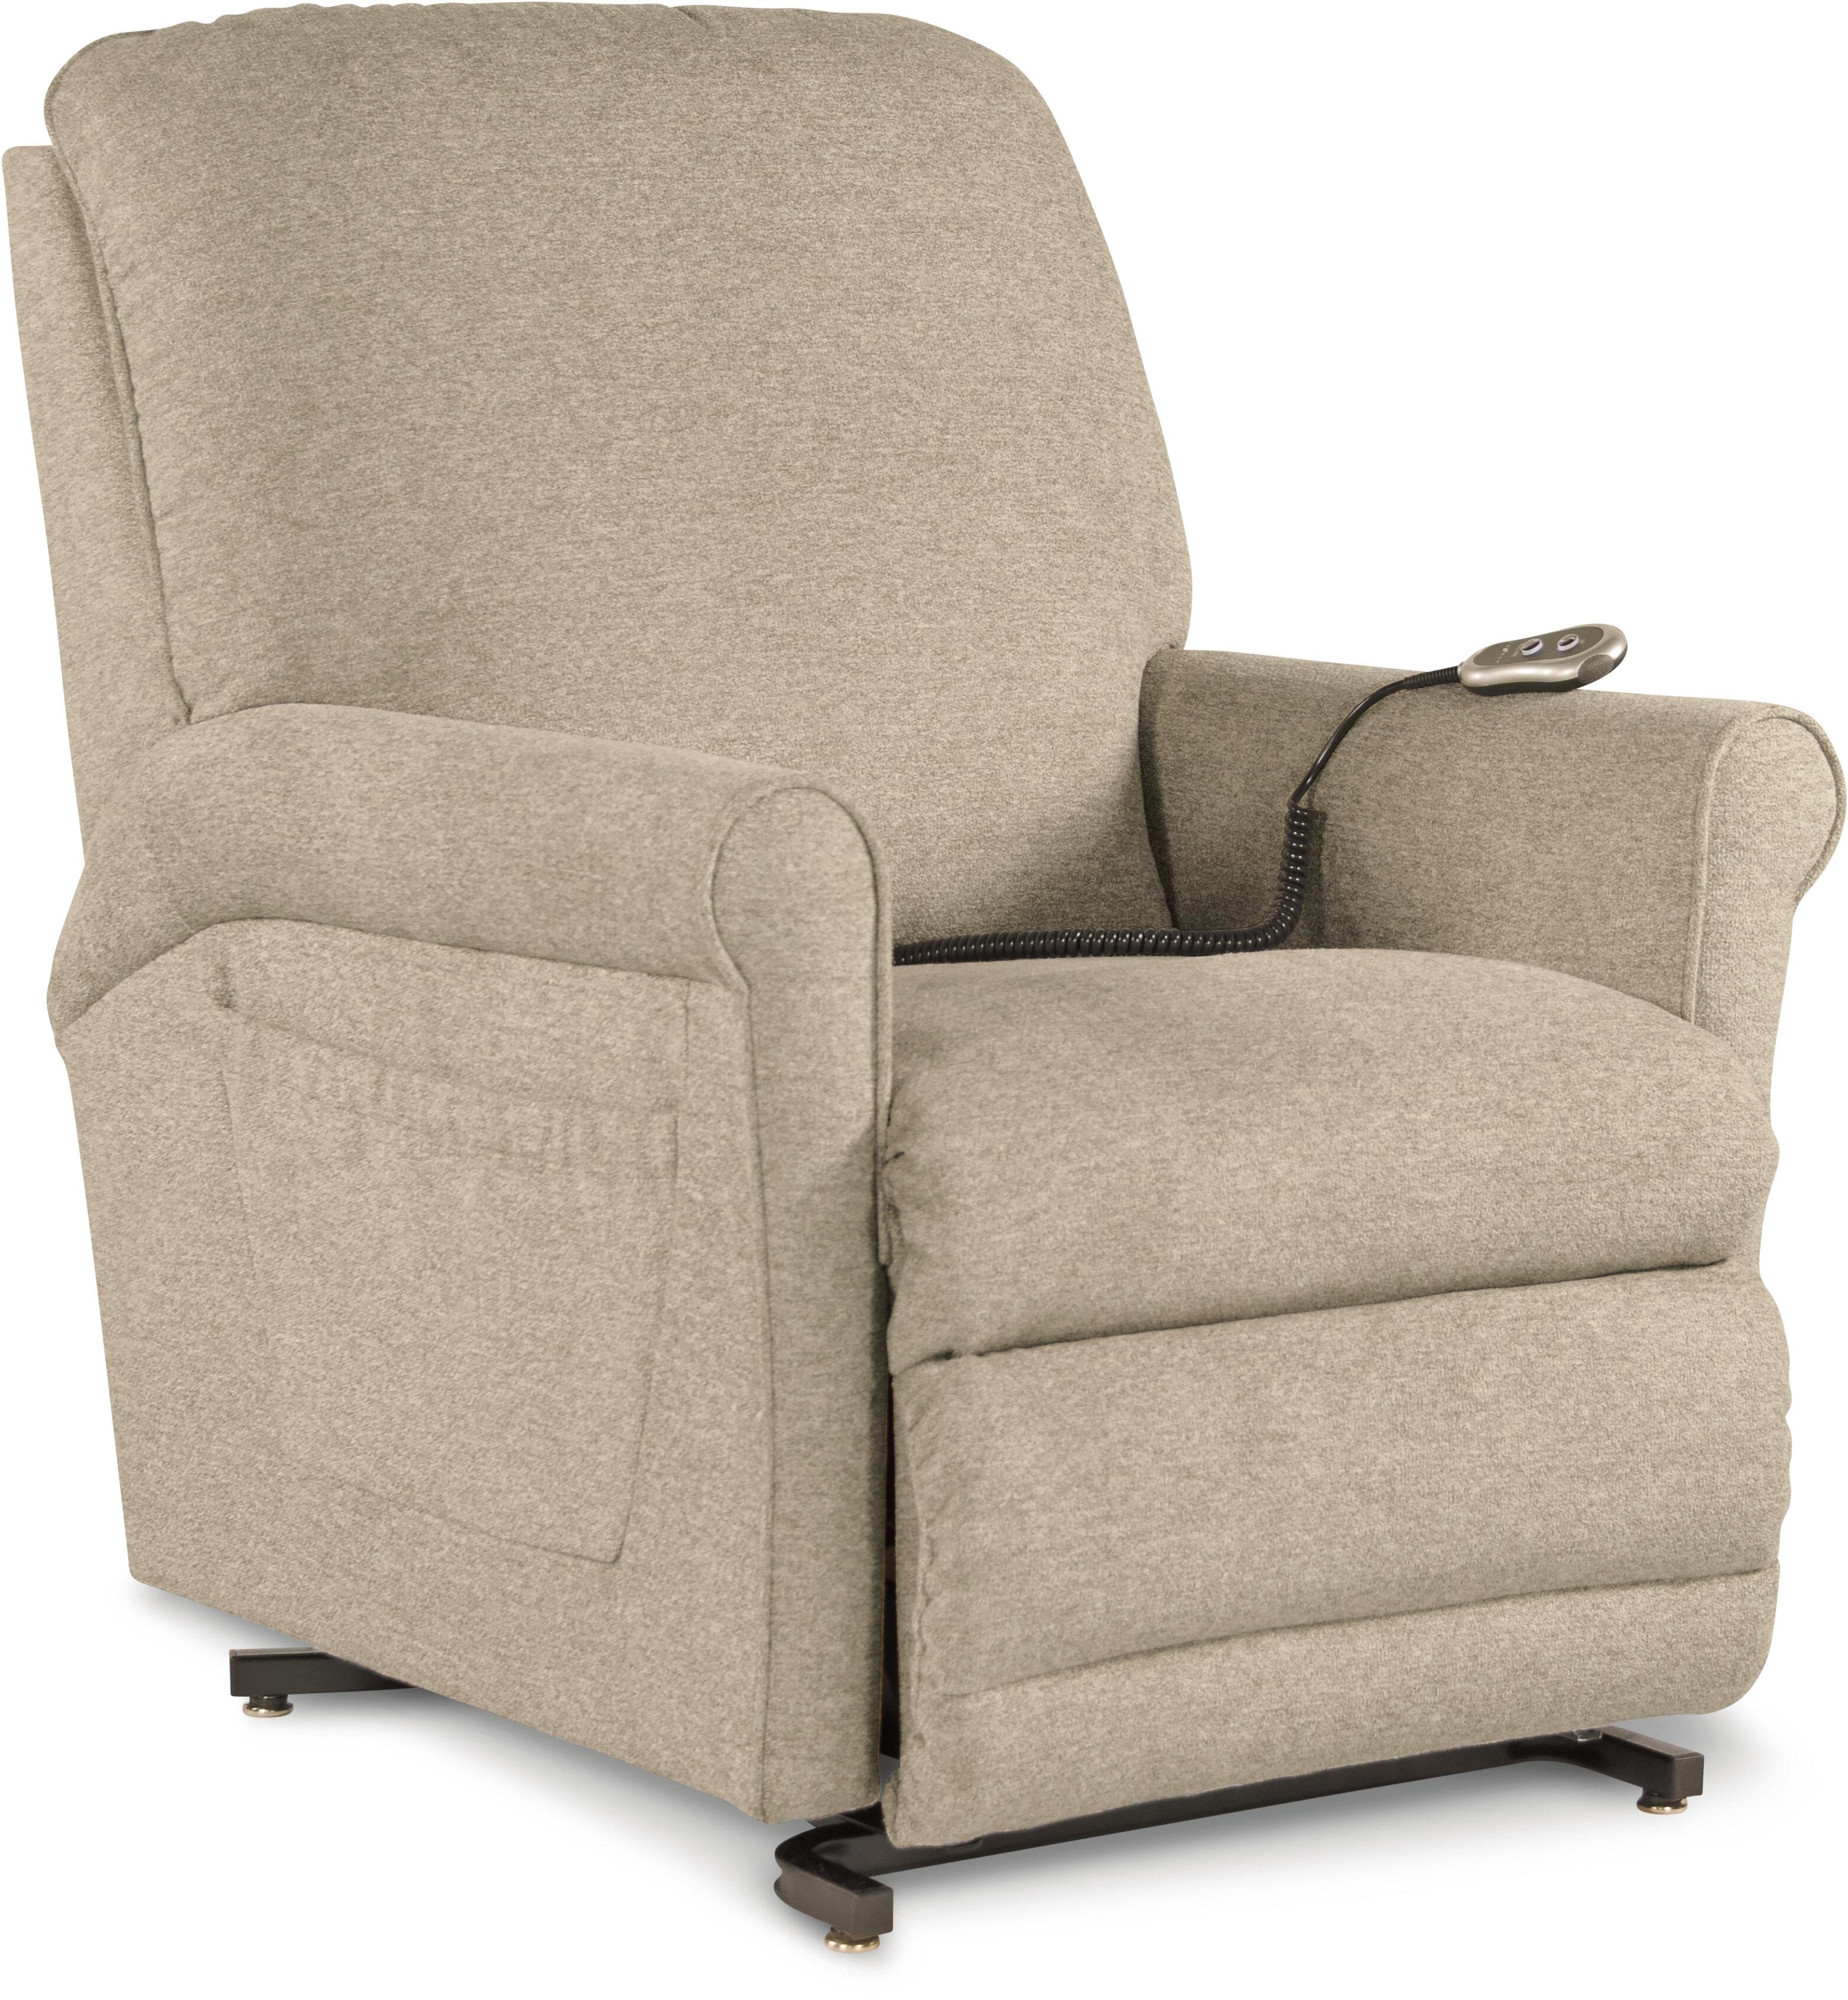 Superb La Z Boy Miller Power Recliner Wayfair Spiritservingveterans Wood Chair Design Ideas Spiritservingveteransorg